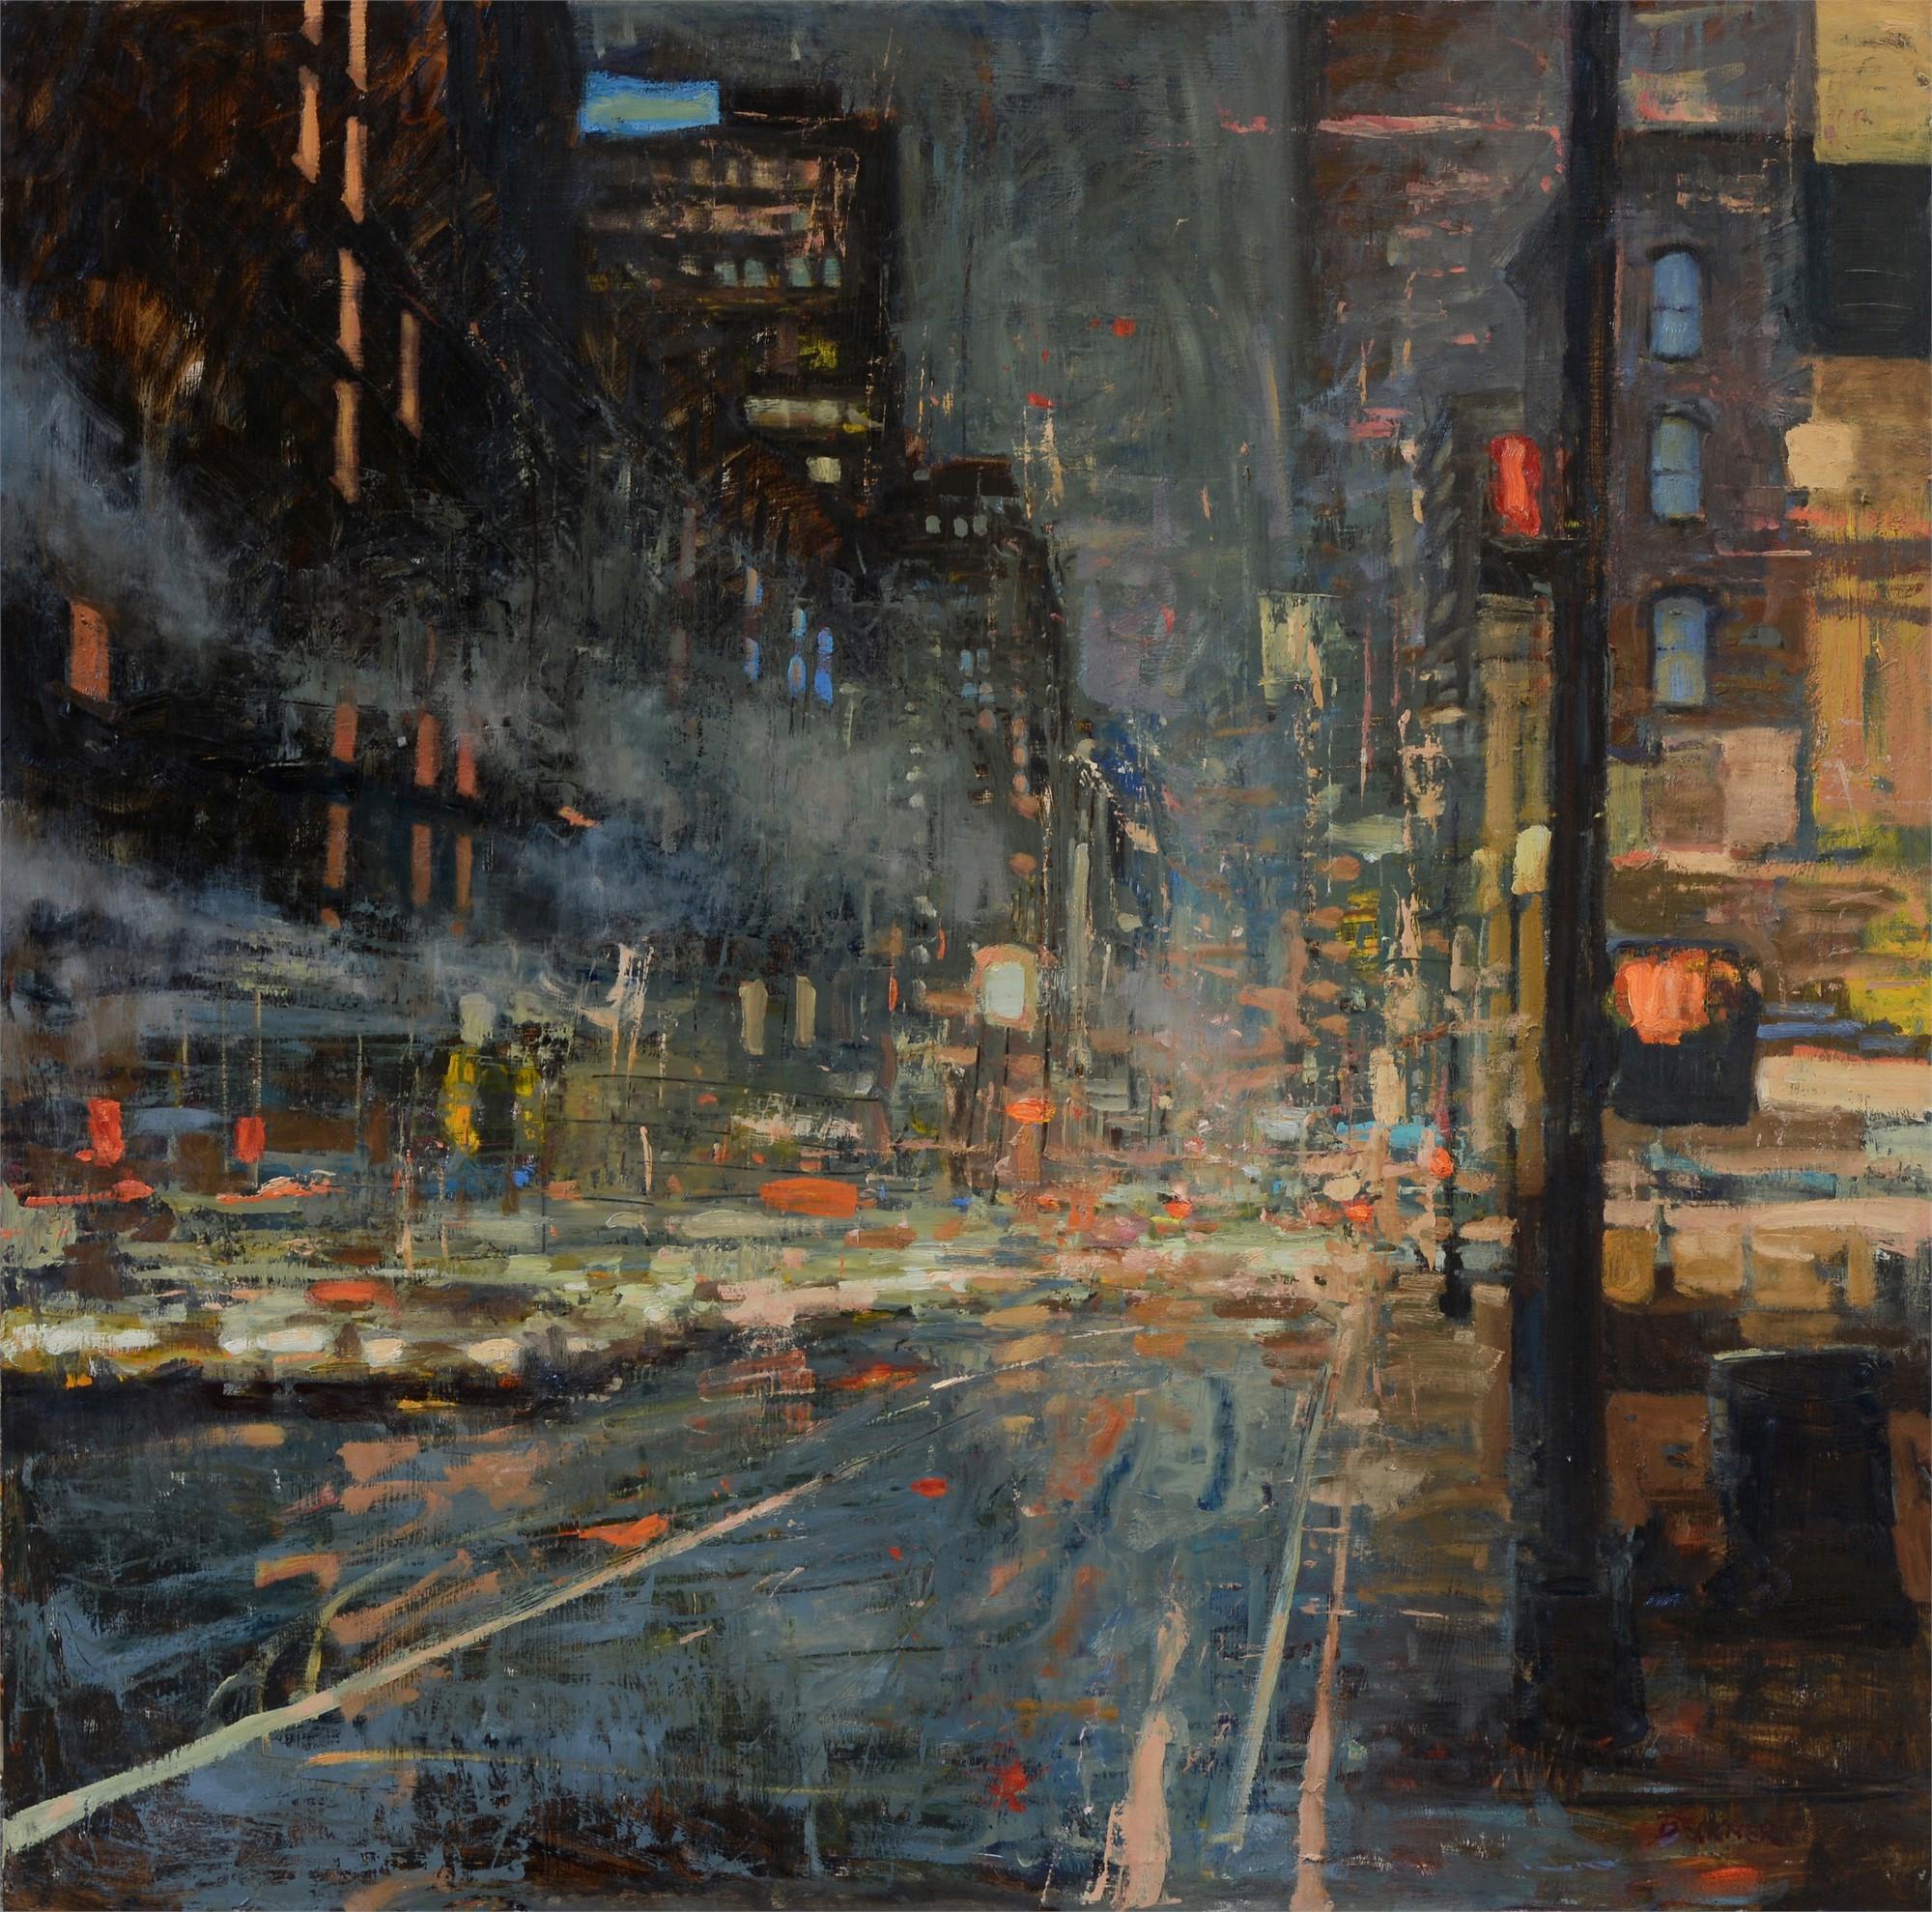 Urban Mist by Jim Beckner